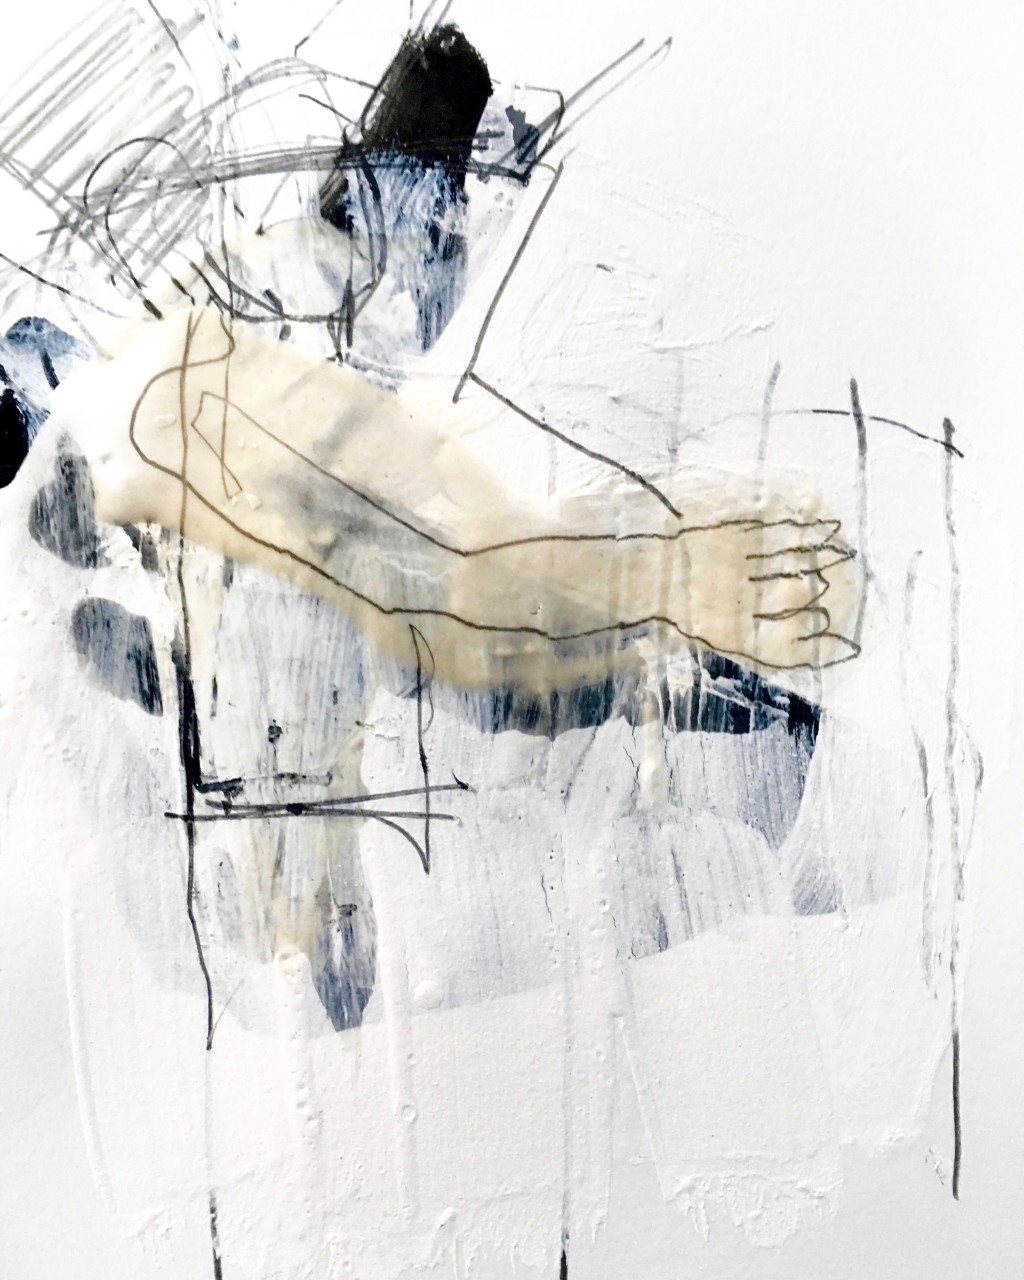 mixed media drawing of human figure